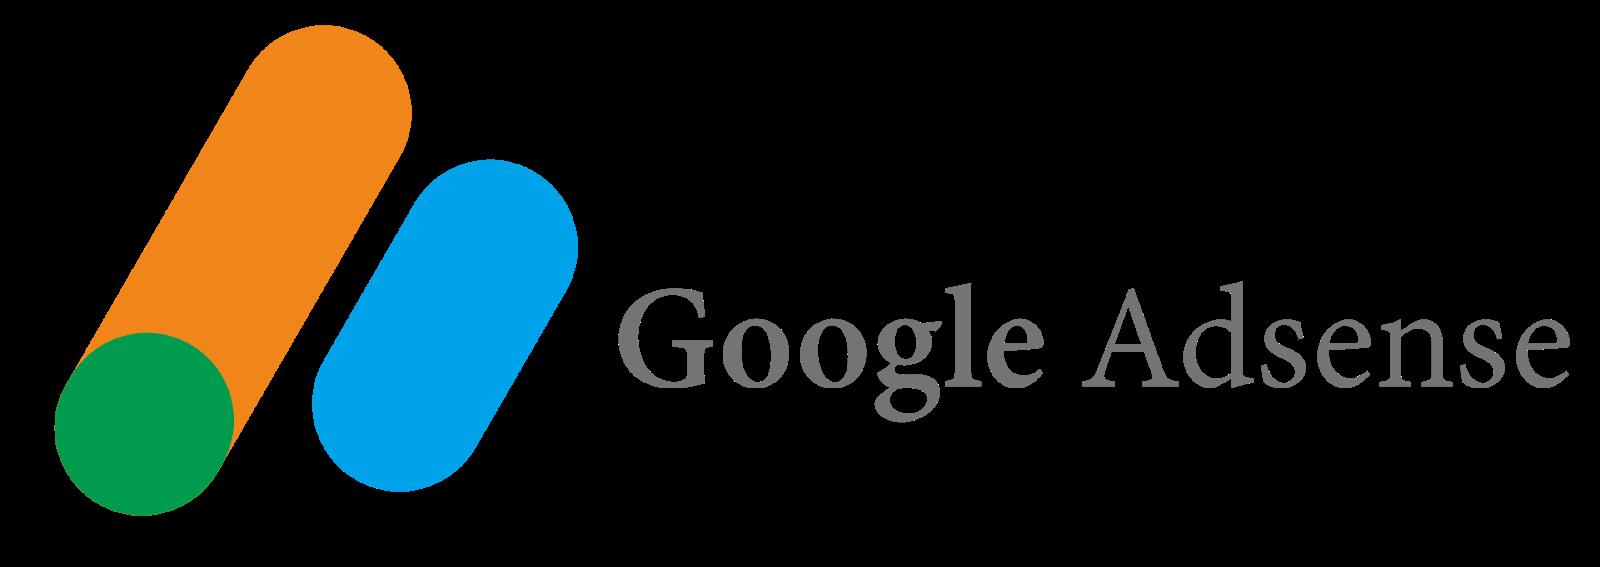 New Logo Google Adsense PNG